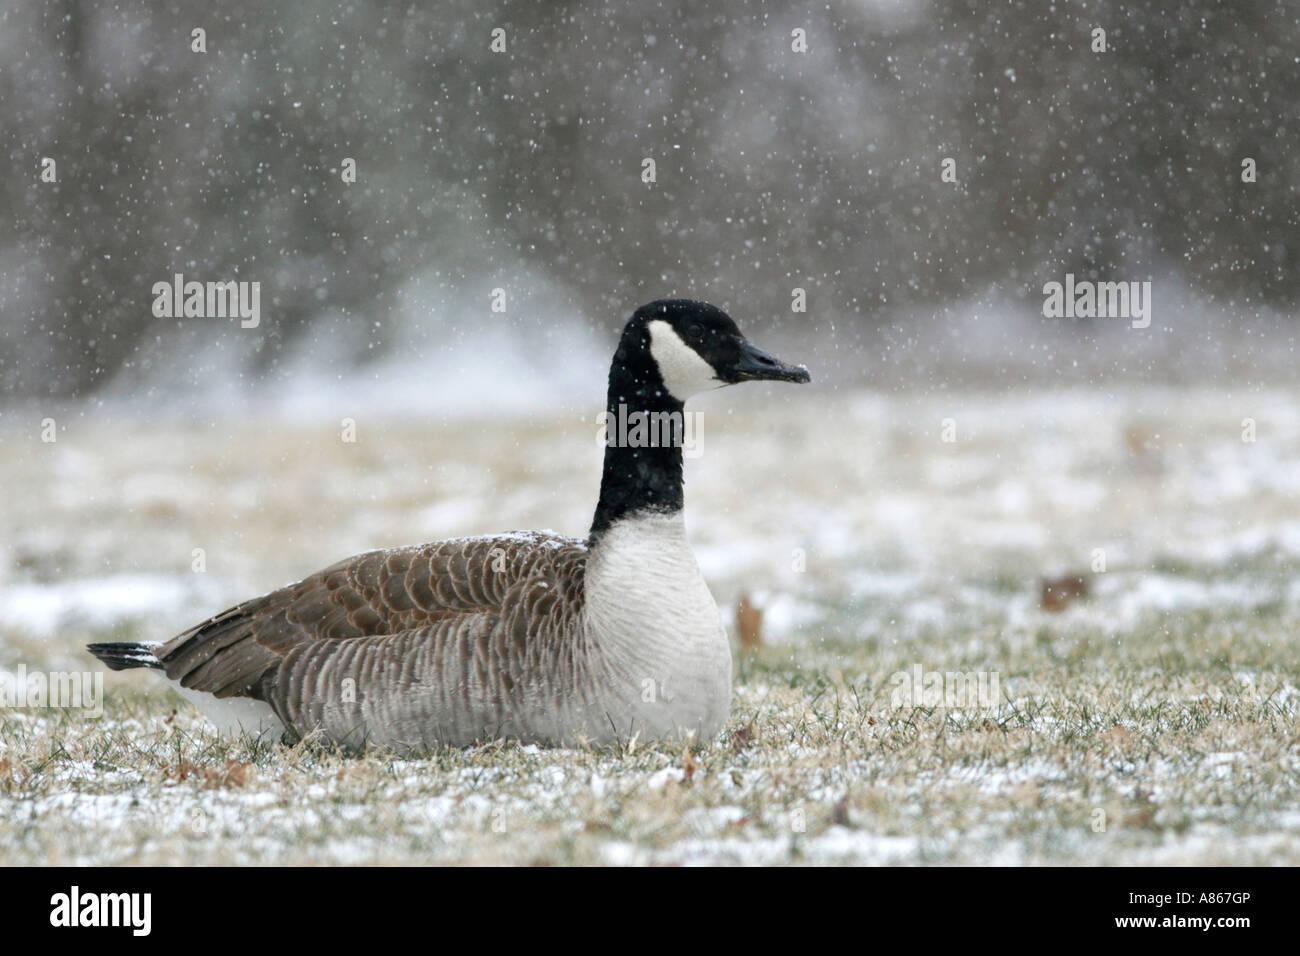 Canada goose stock photos canada goose stock images alamy canada goose in falling snow stock image biocorpaavc